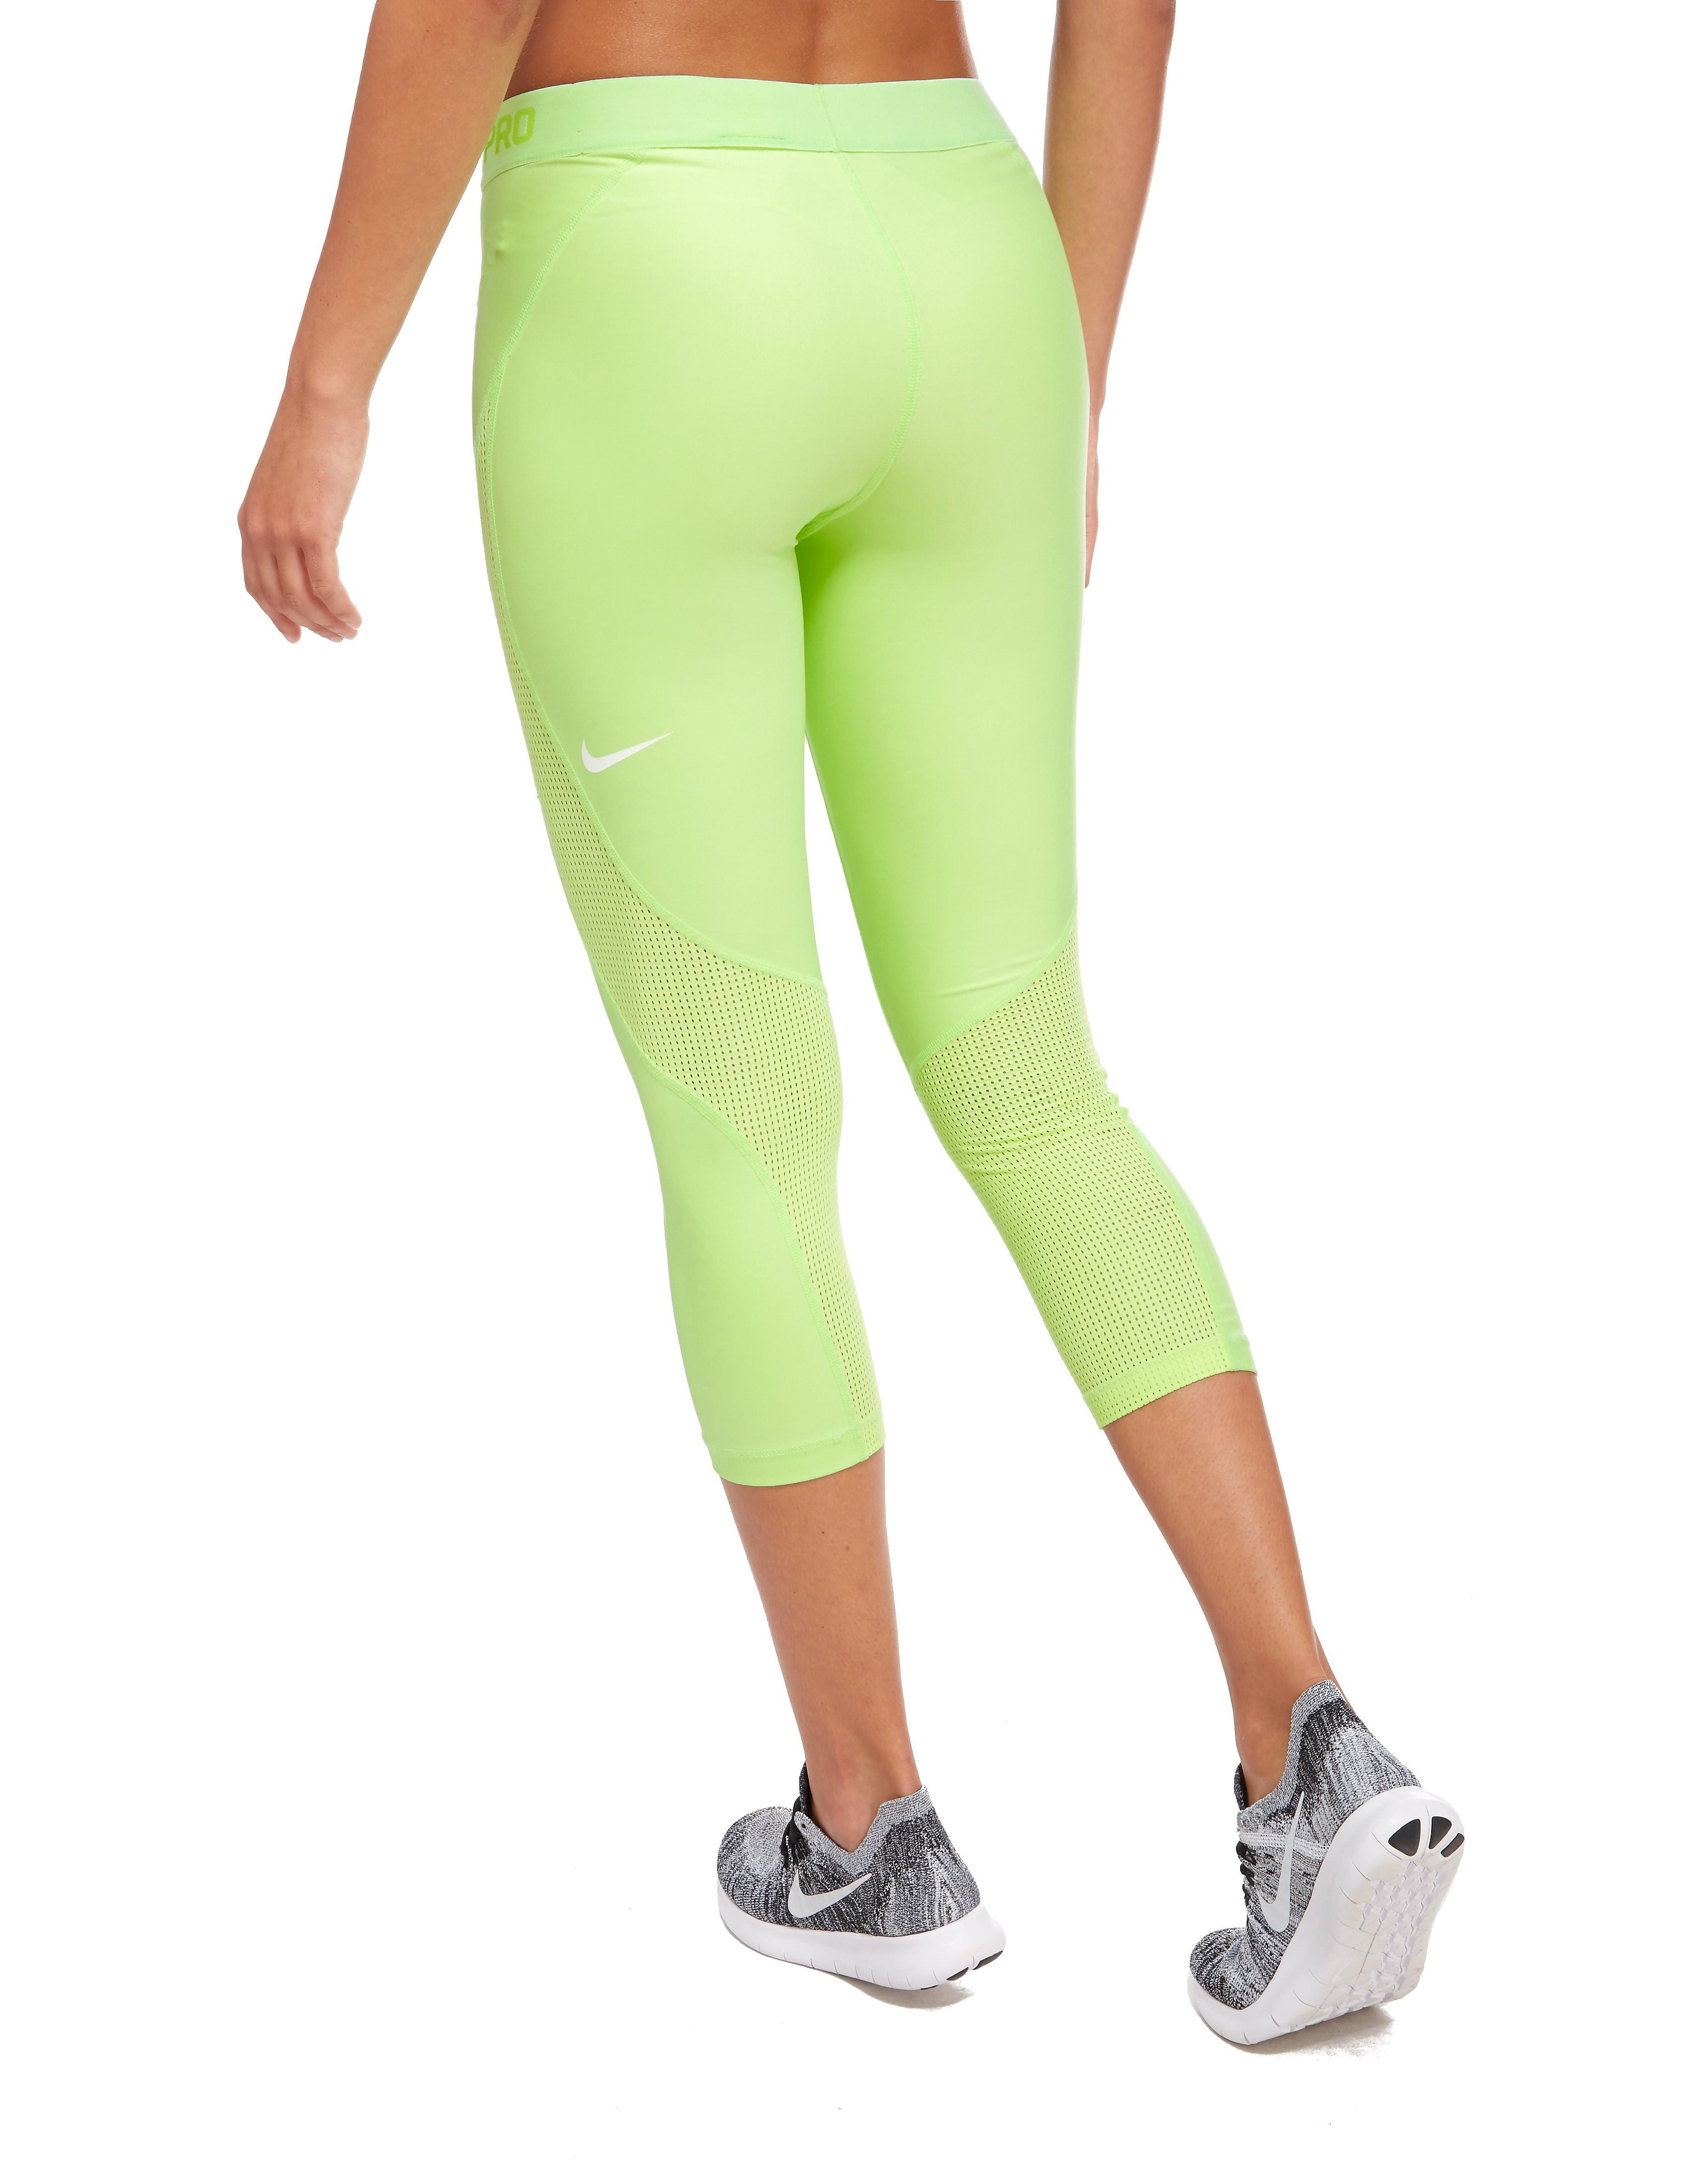 Nike Hypercool Summer Wash Capris